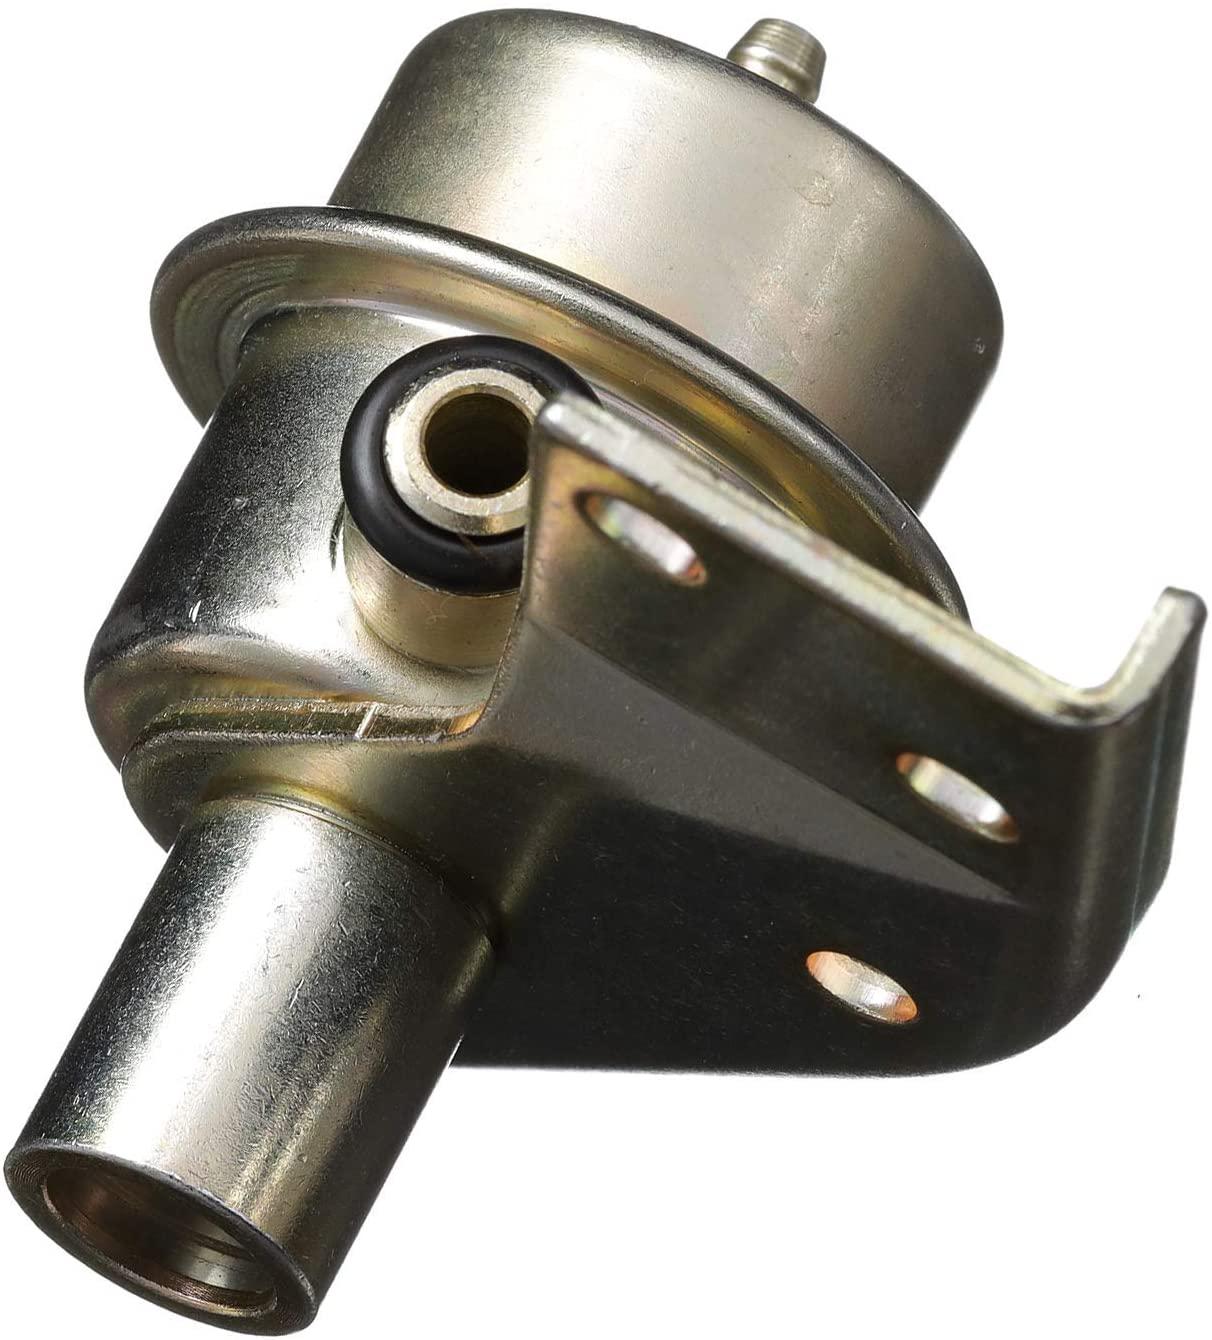 Delphi FP10504 Fuel Pressure Regulator, 1 Pack